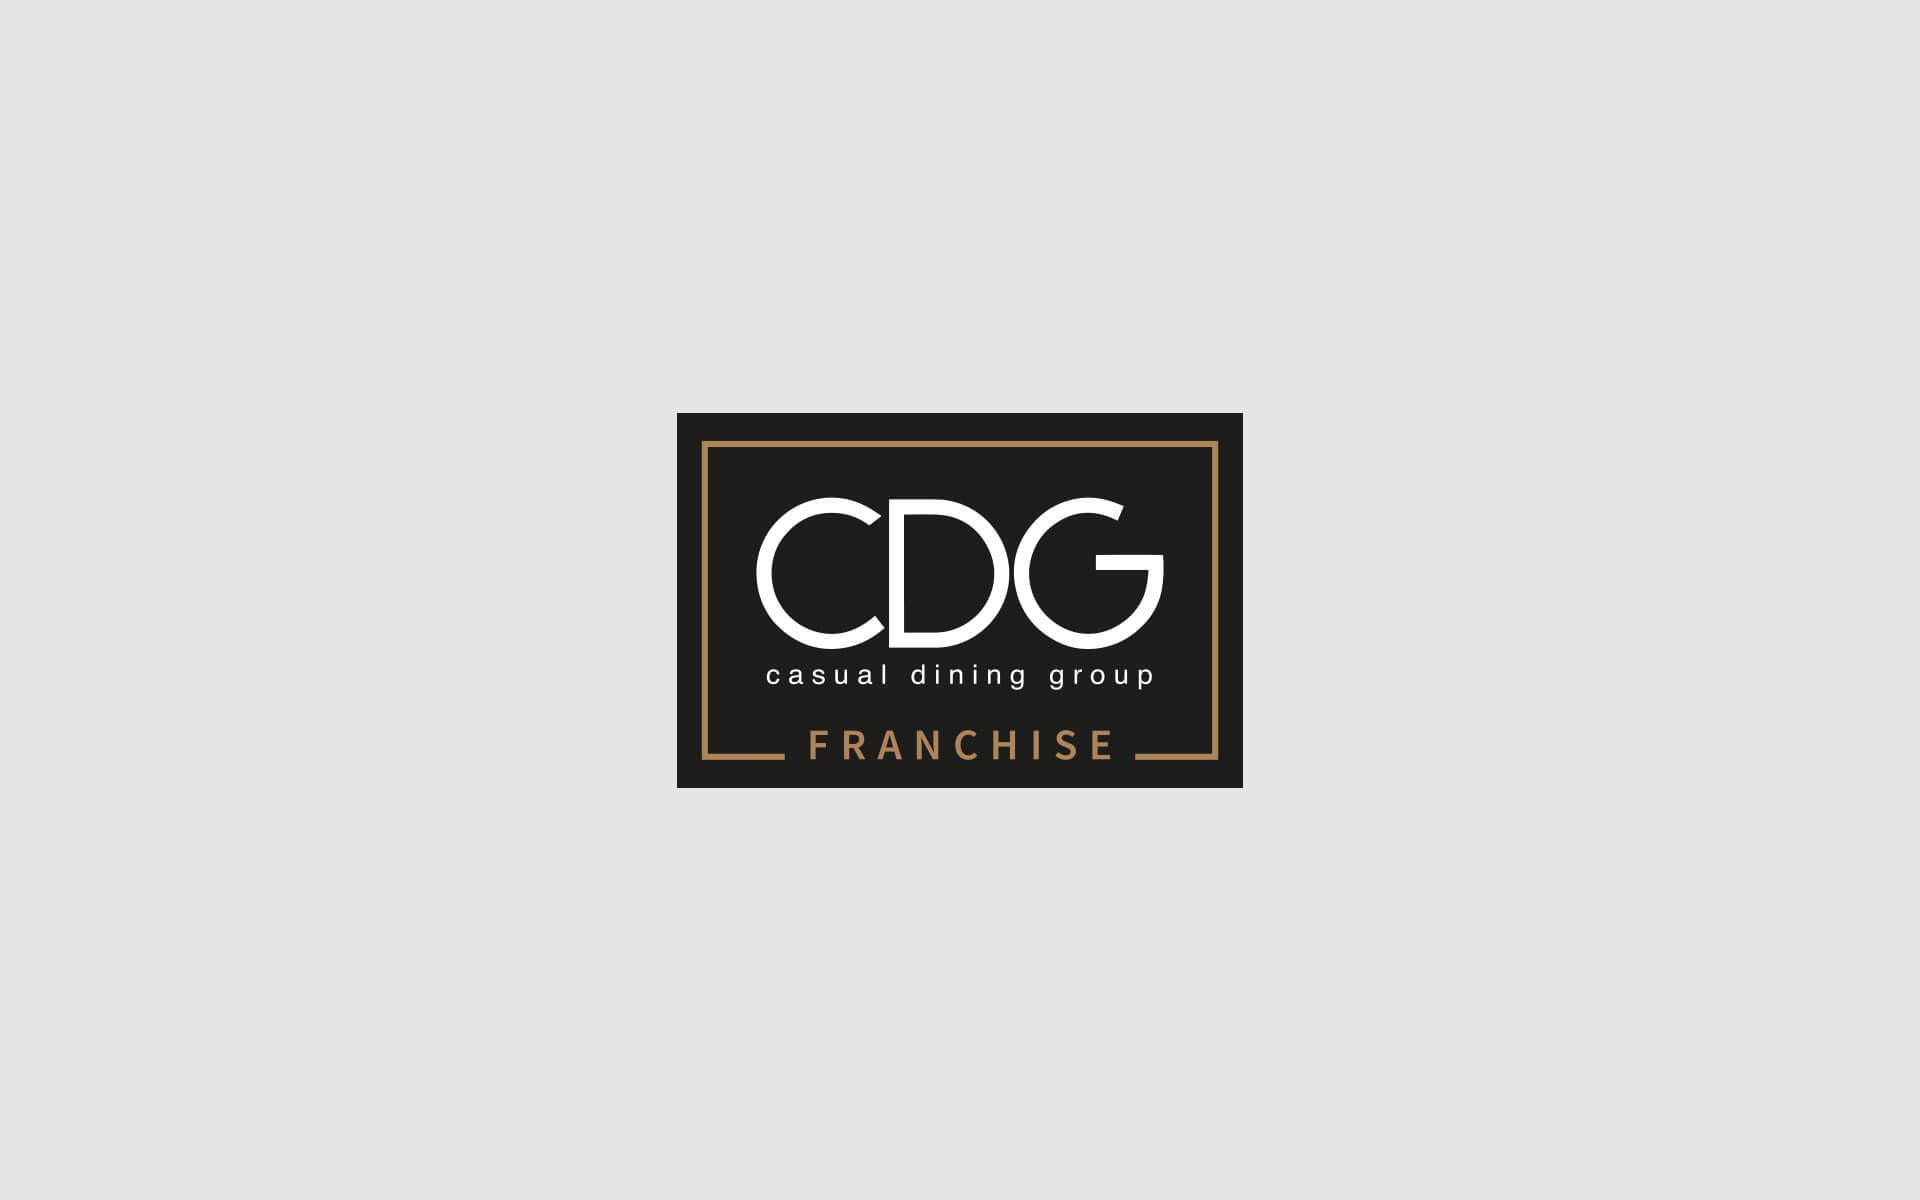 CDG franchise logo